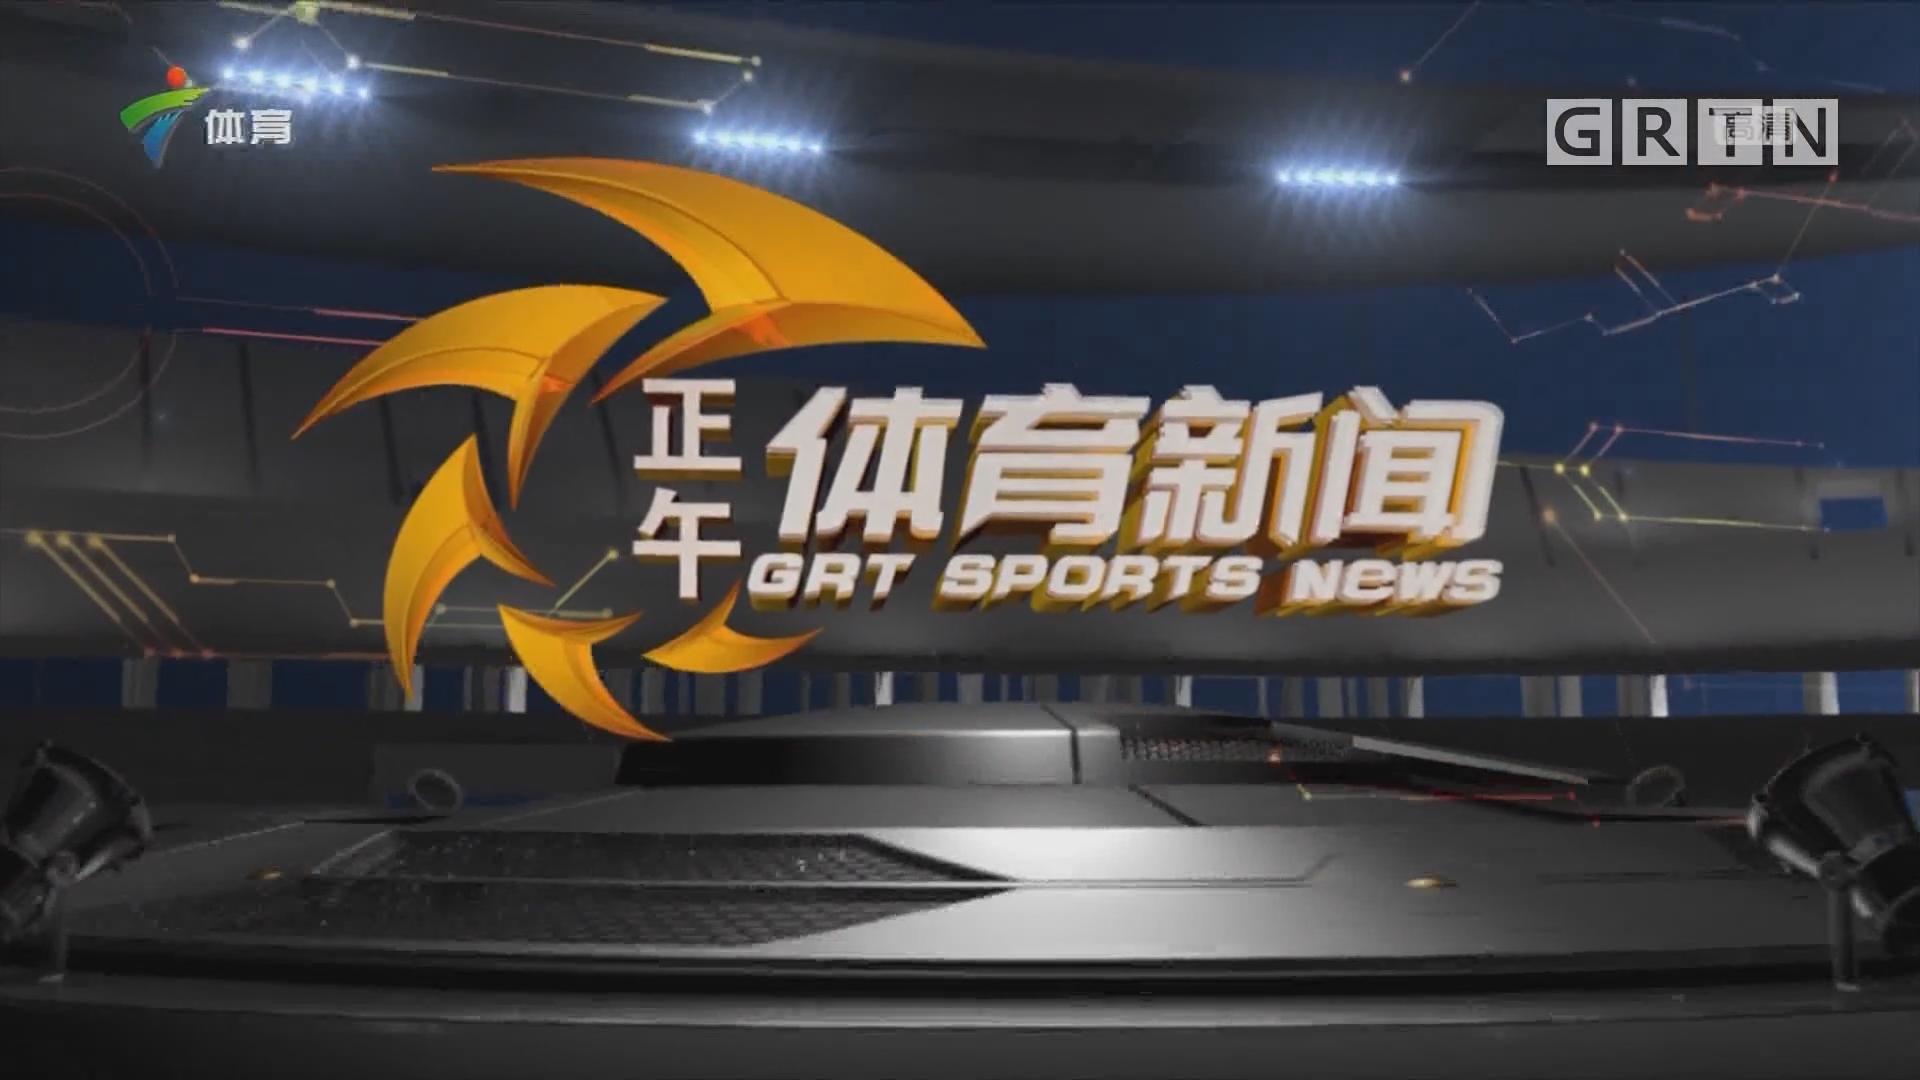 [HD][2019-11-19]正午体育新闻:CBA周最佳:易建联、亚当斯当选